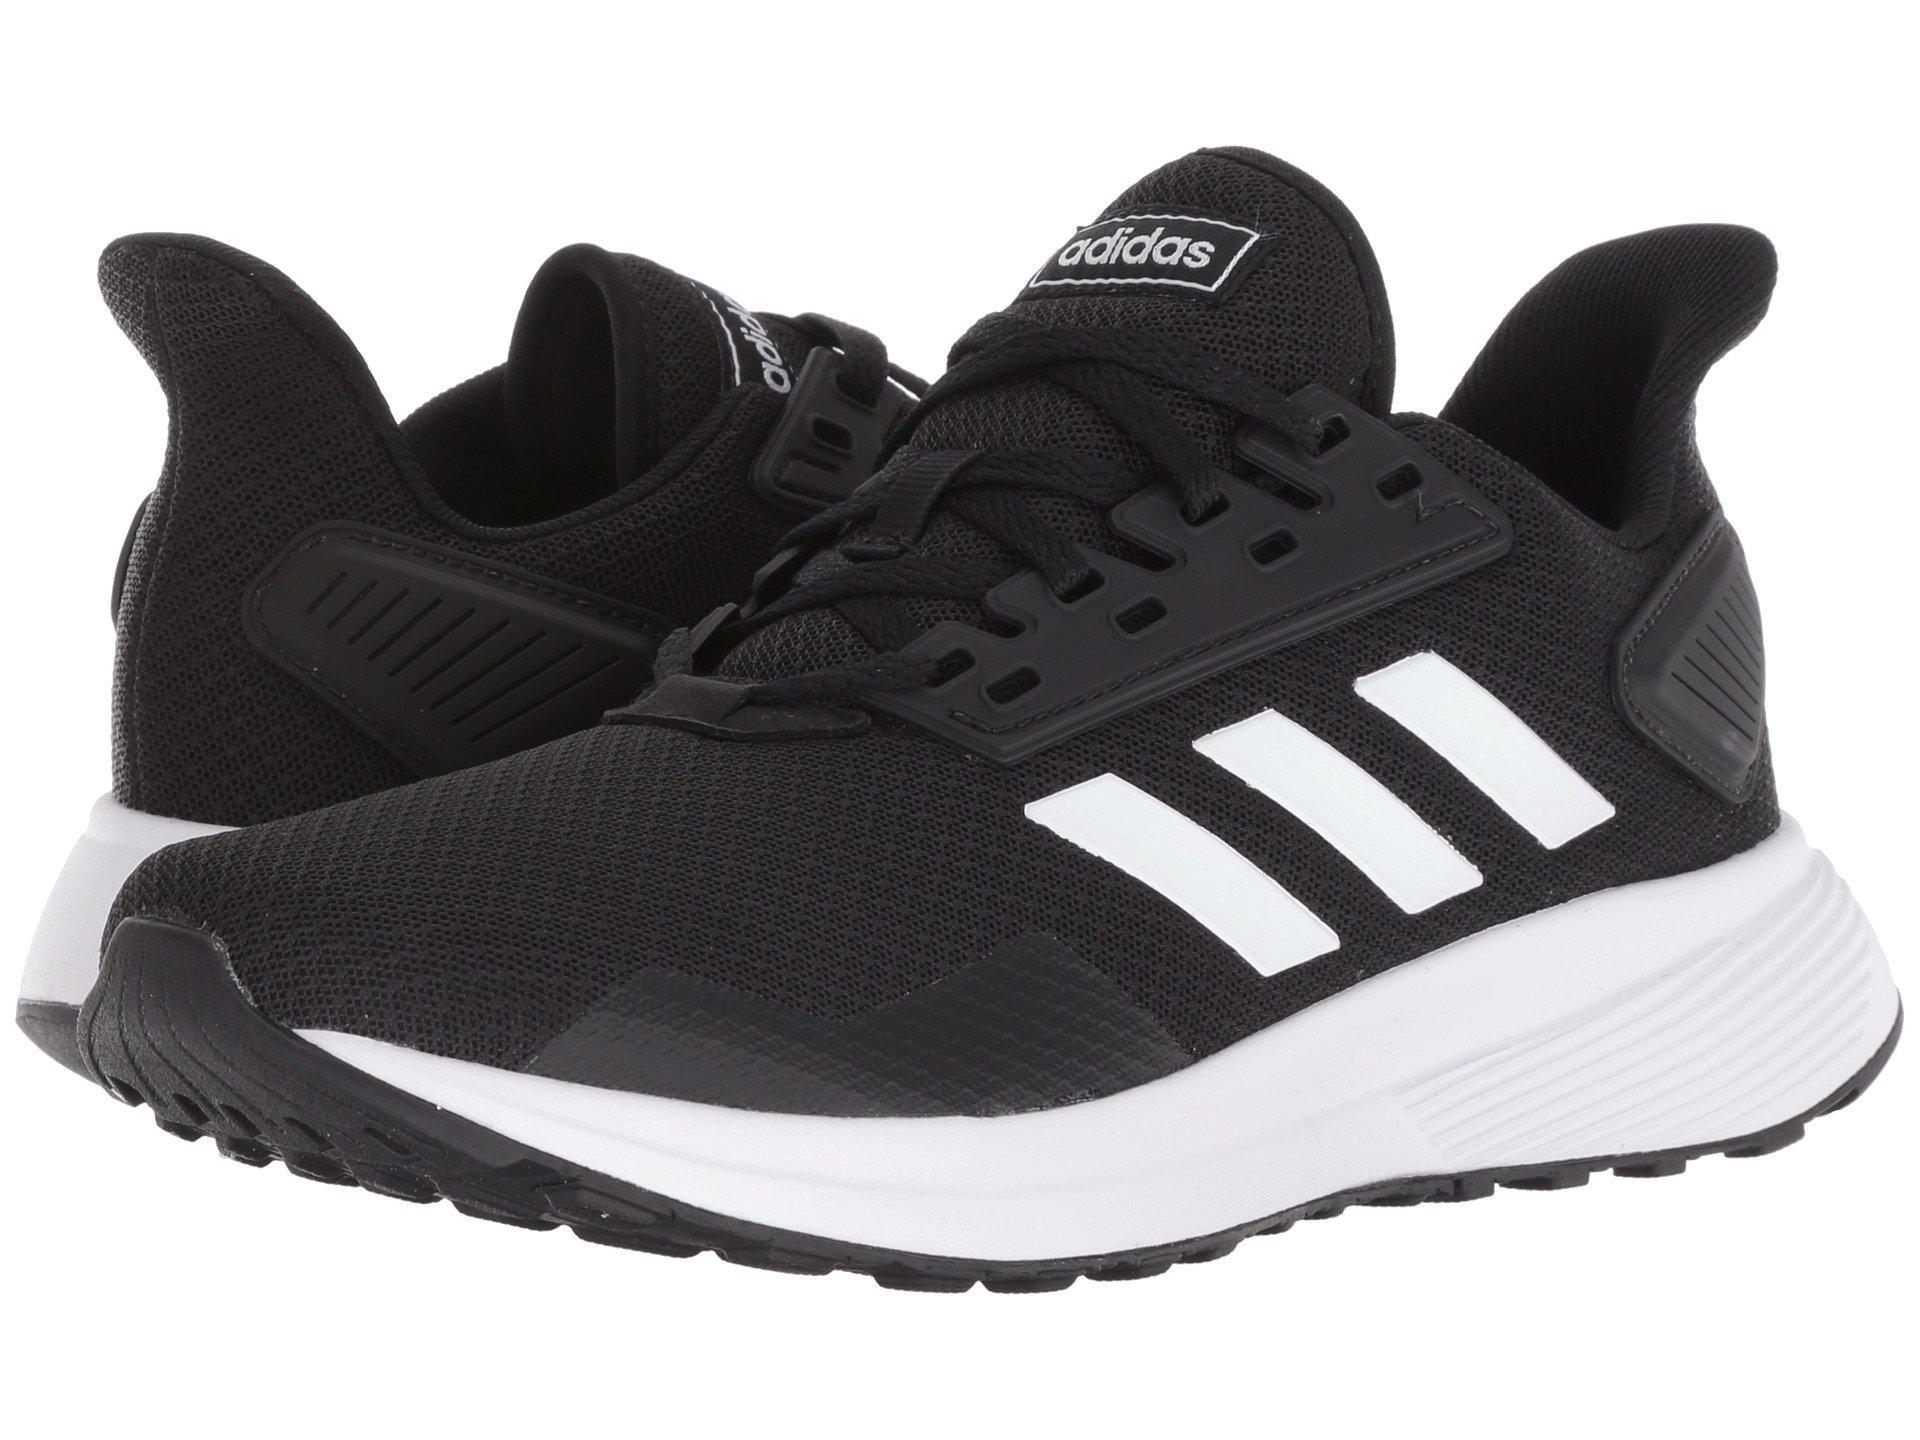 ca878b531 adidas Originals. Black Duramo 9 (grey Three F17 grey Three F17 grey One F17)  Men s Shoes